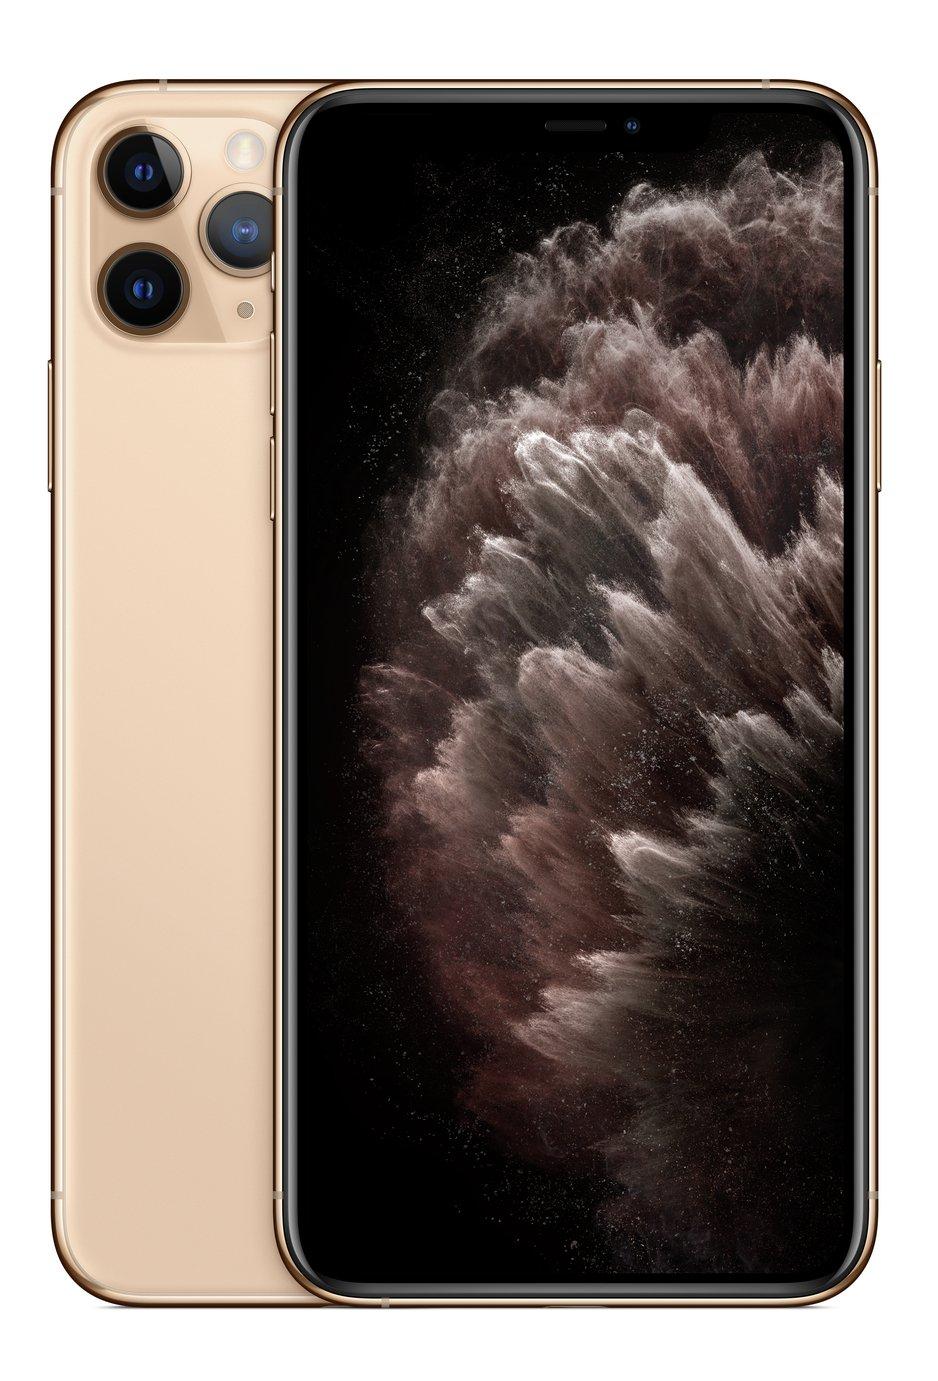 SIM Free iPhone 11 Pro Max 256GB Gold - Pre-order